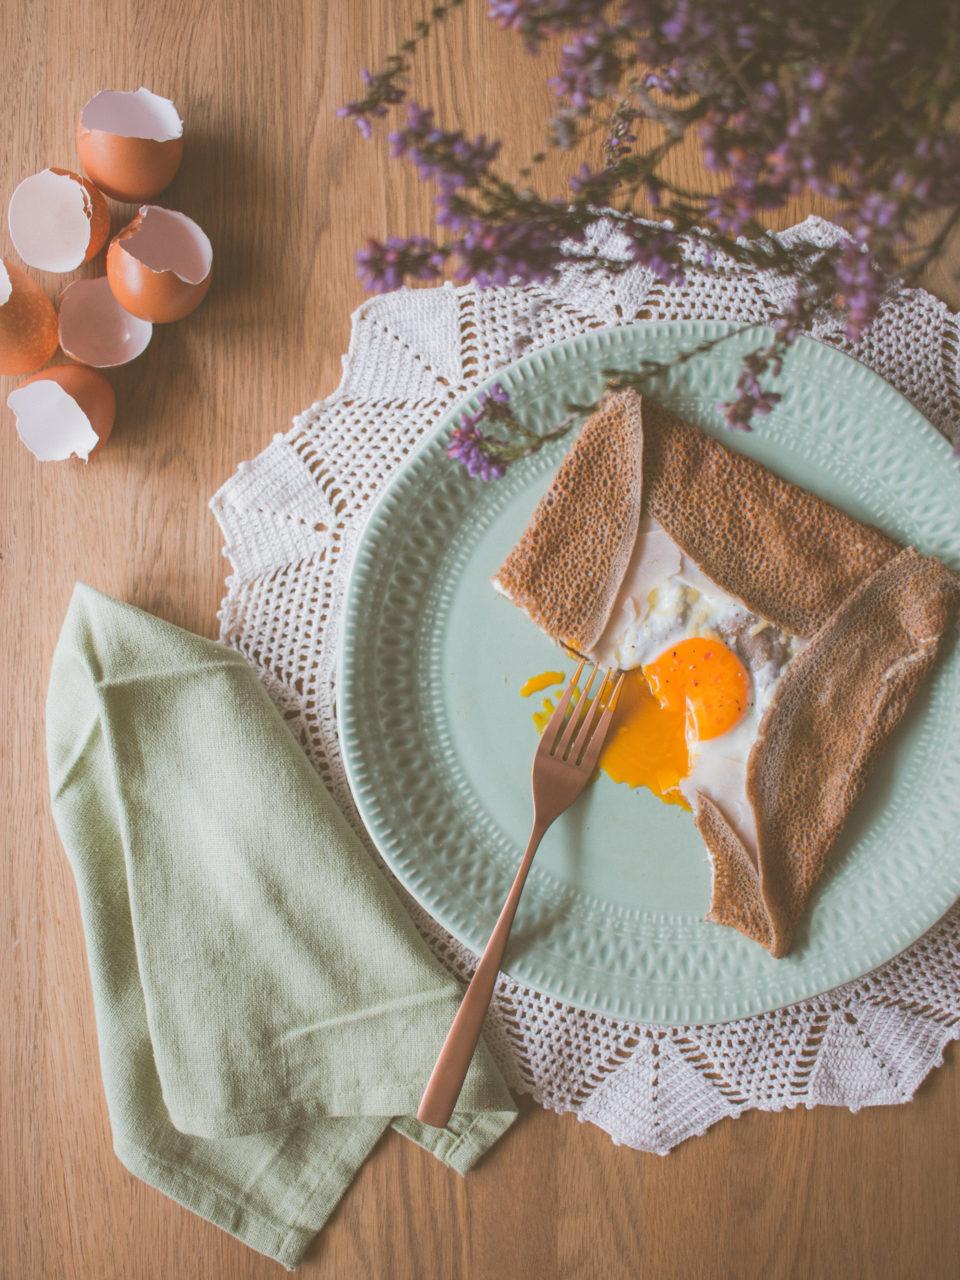 Galette de sarraceno | Buckwheat galette